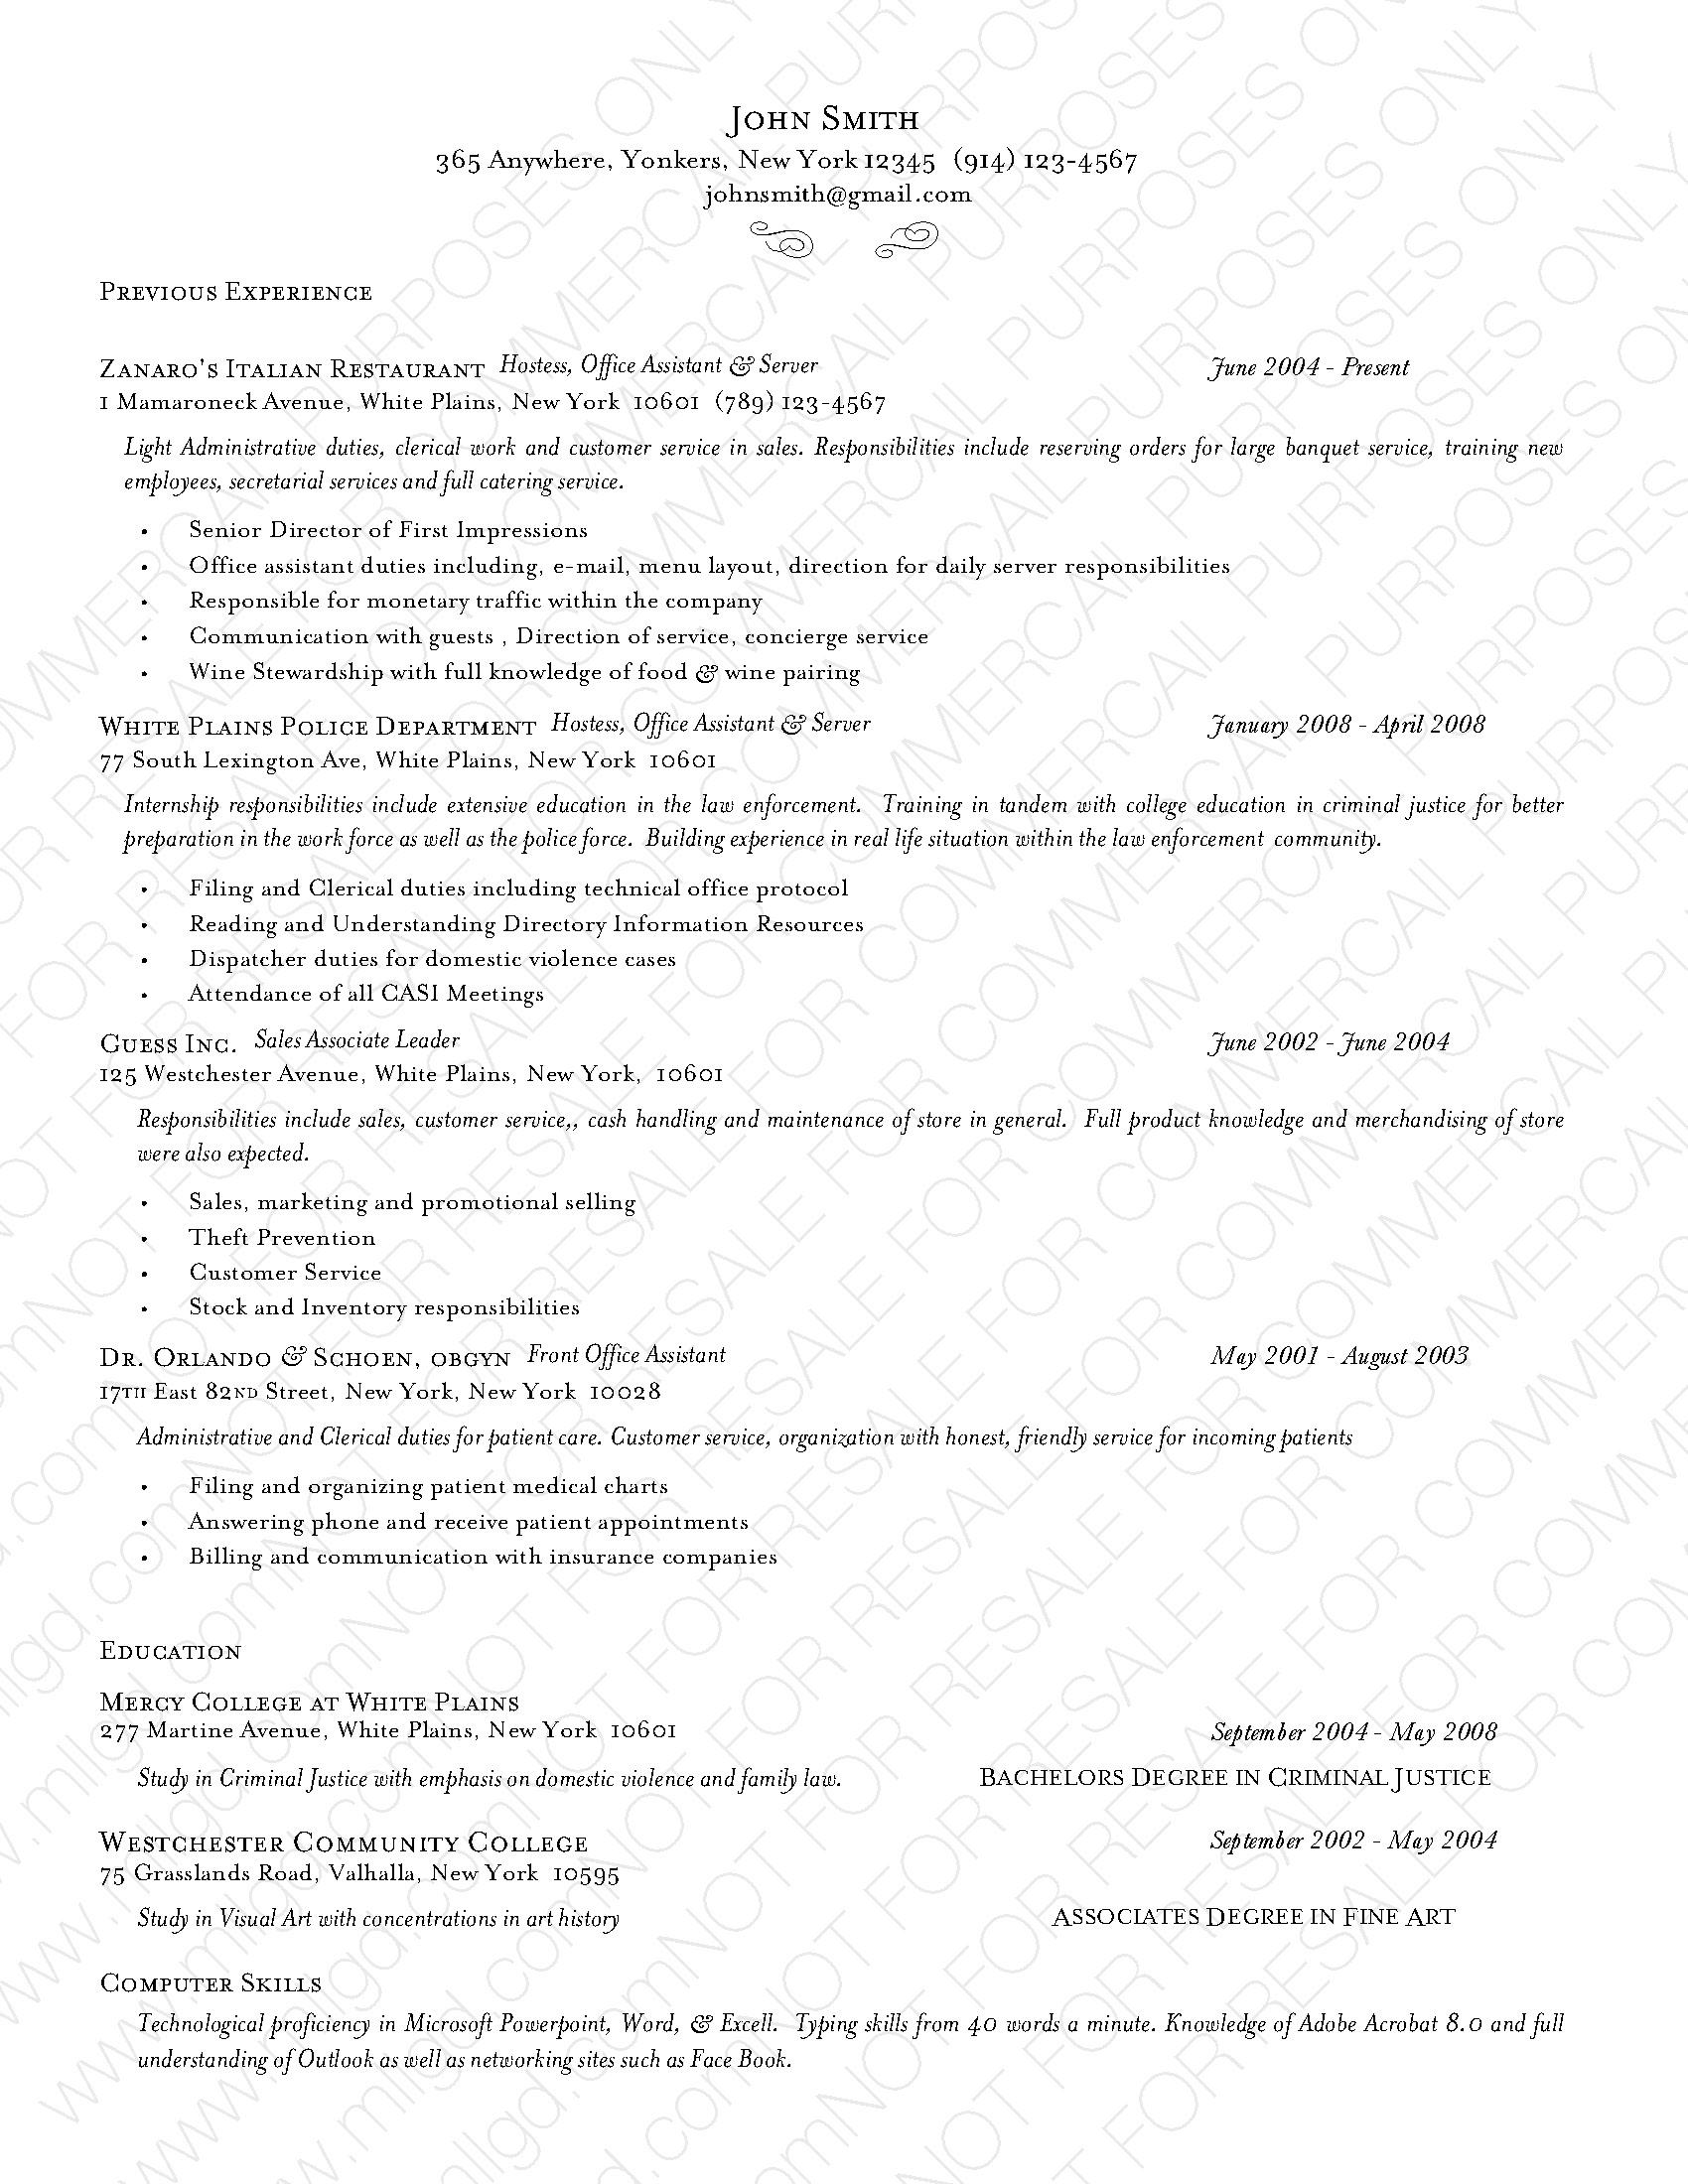 MLL_Resume_Design_2014_Page_52.jpg